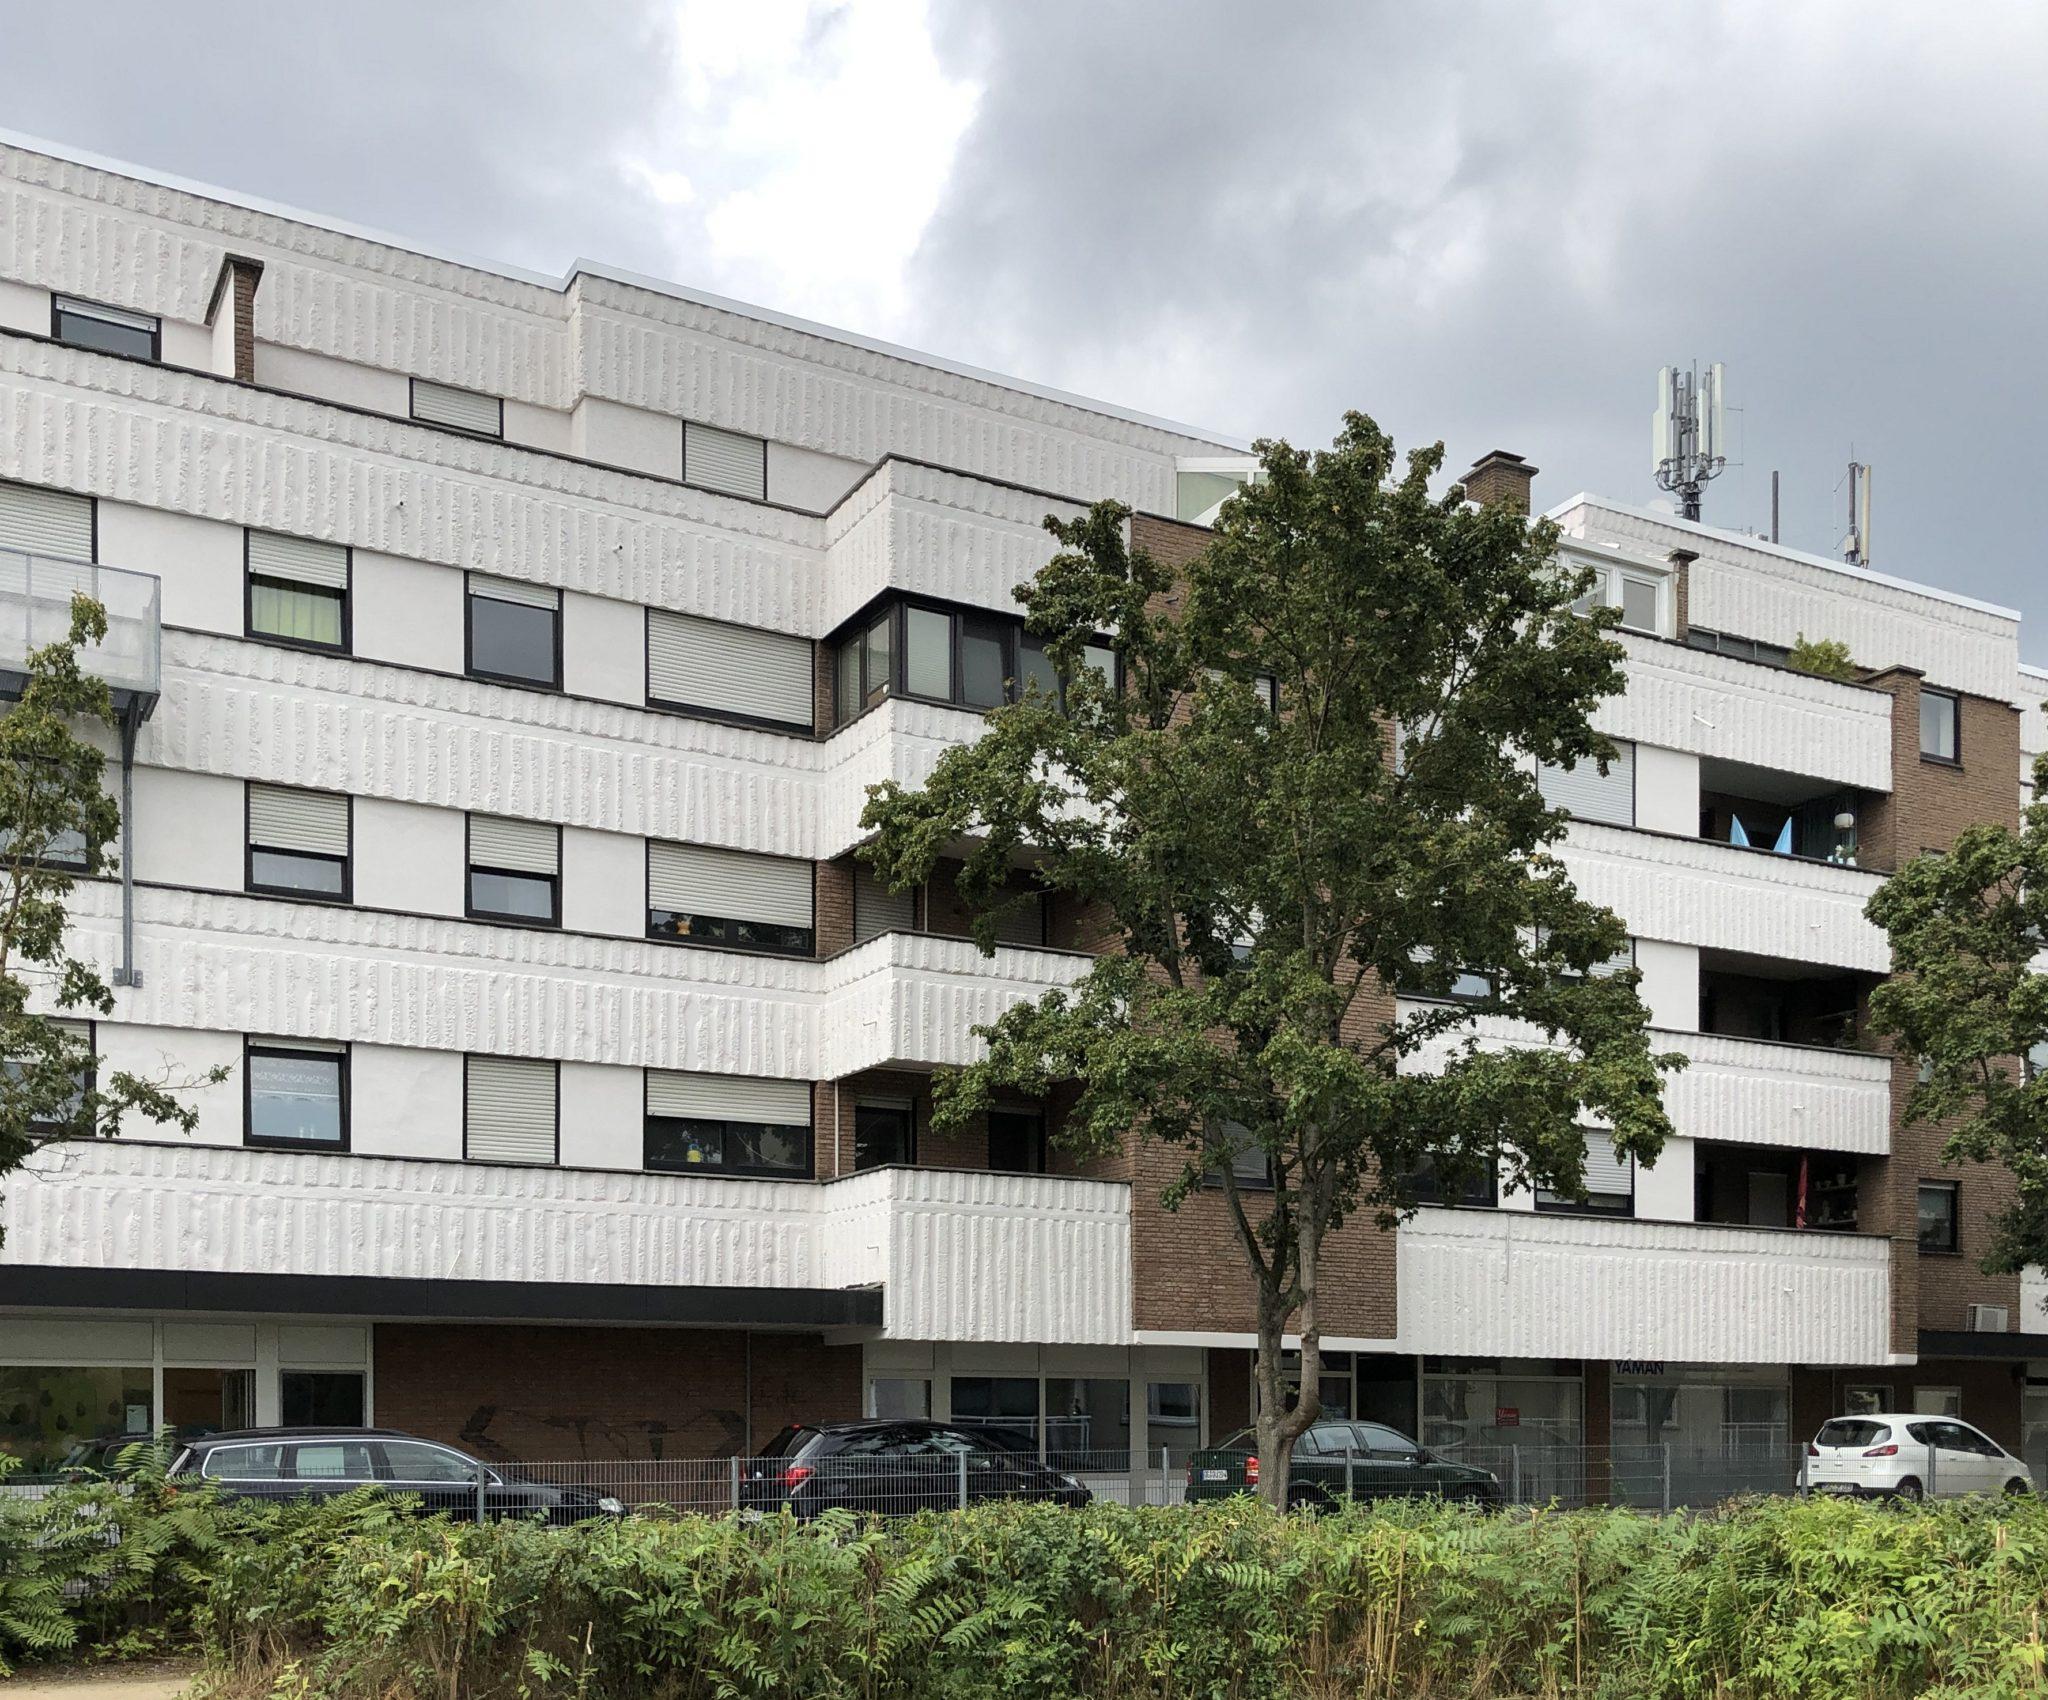 Singlehaushalte frankfurt am main